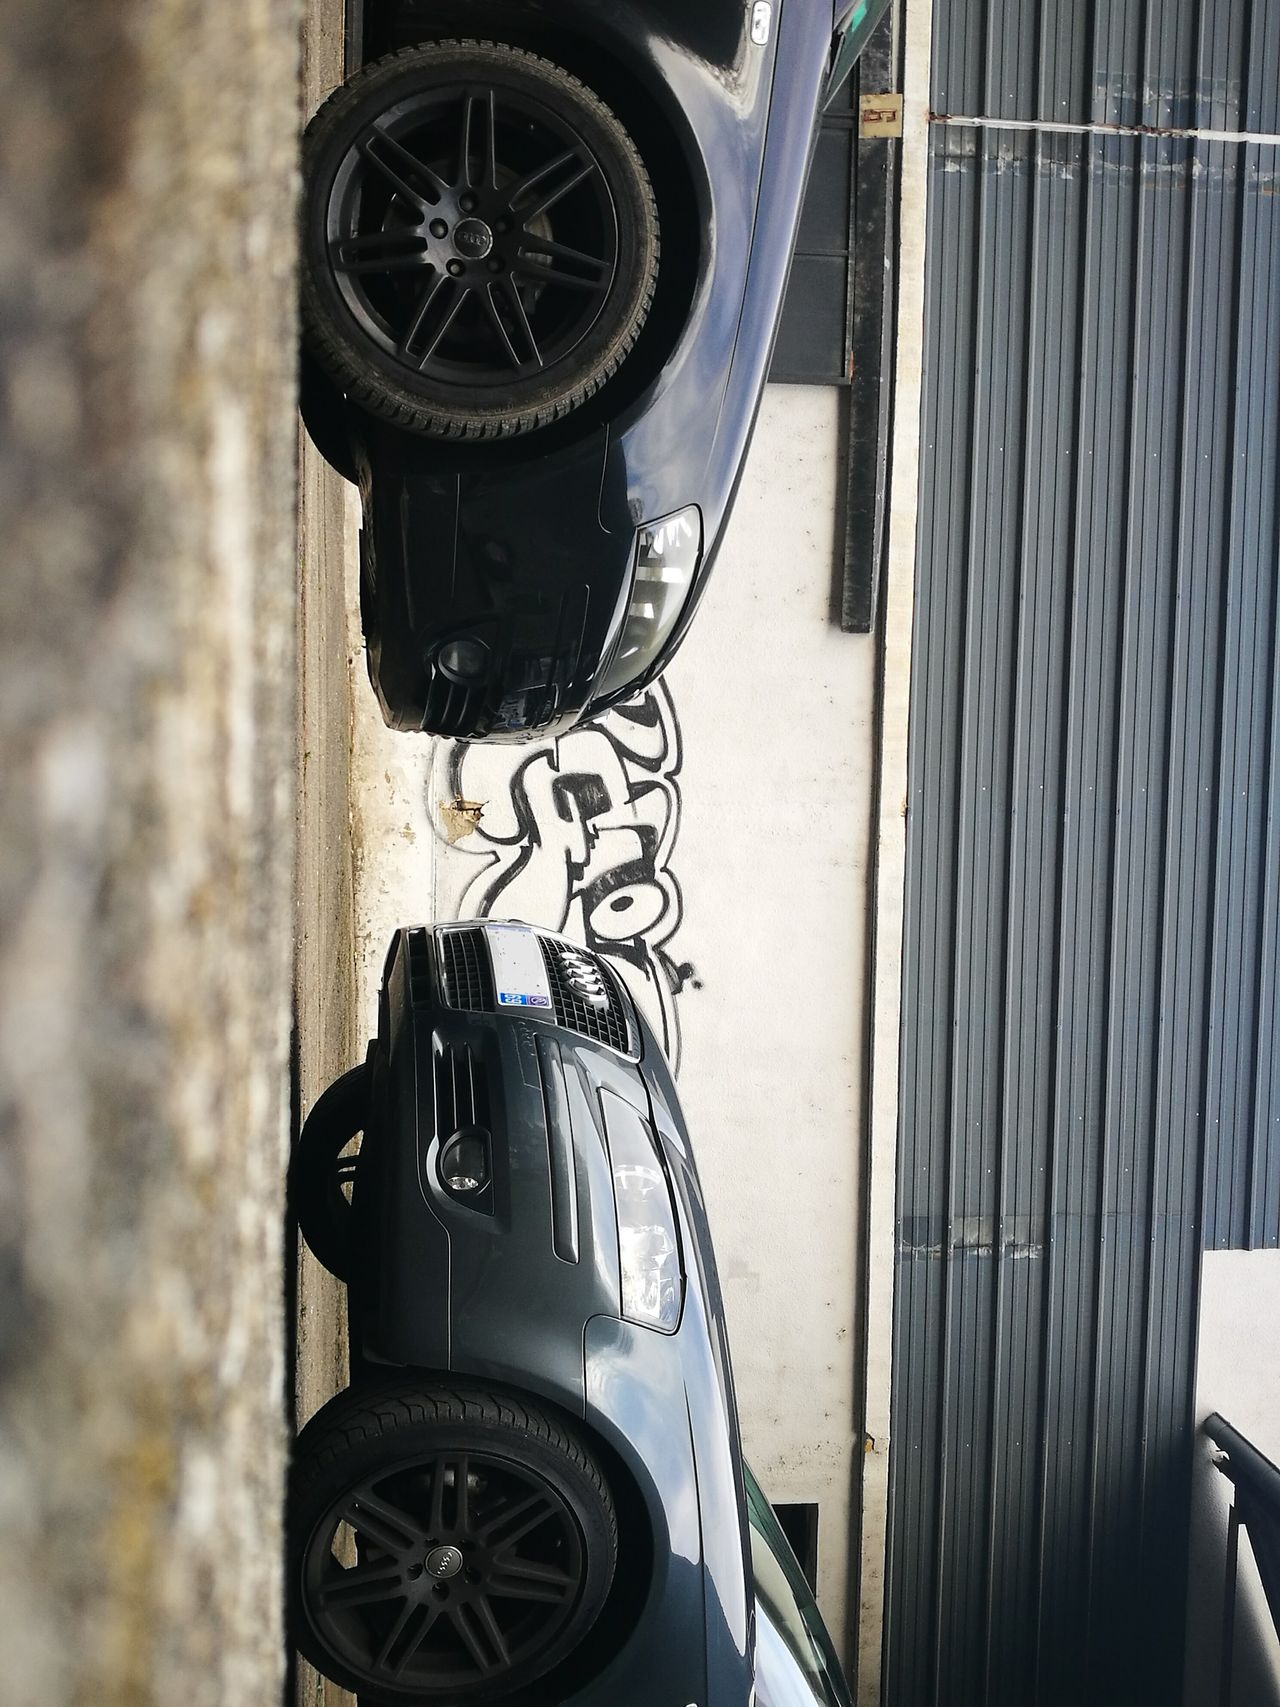 Audi Audi A3 Photography Tags No People Carselfie Voiture De Sport Voiture